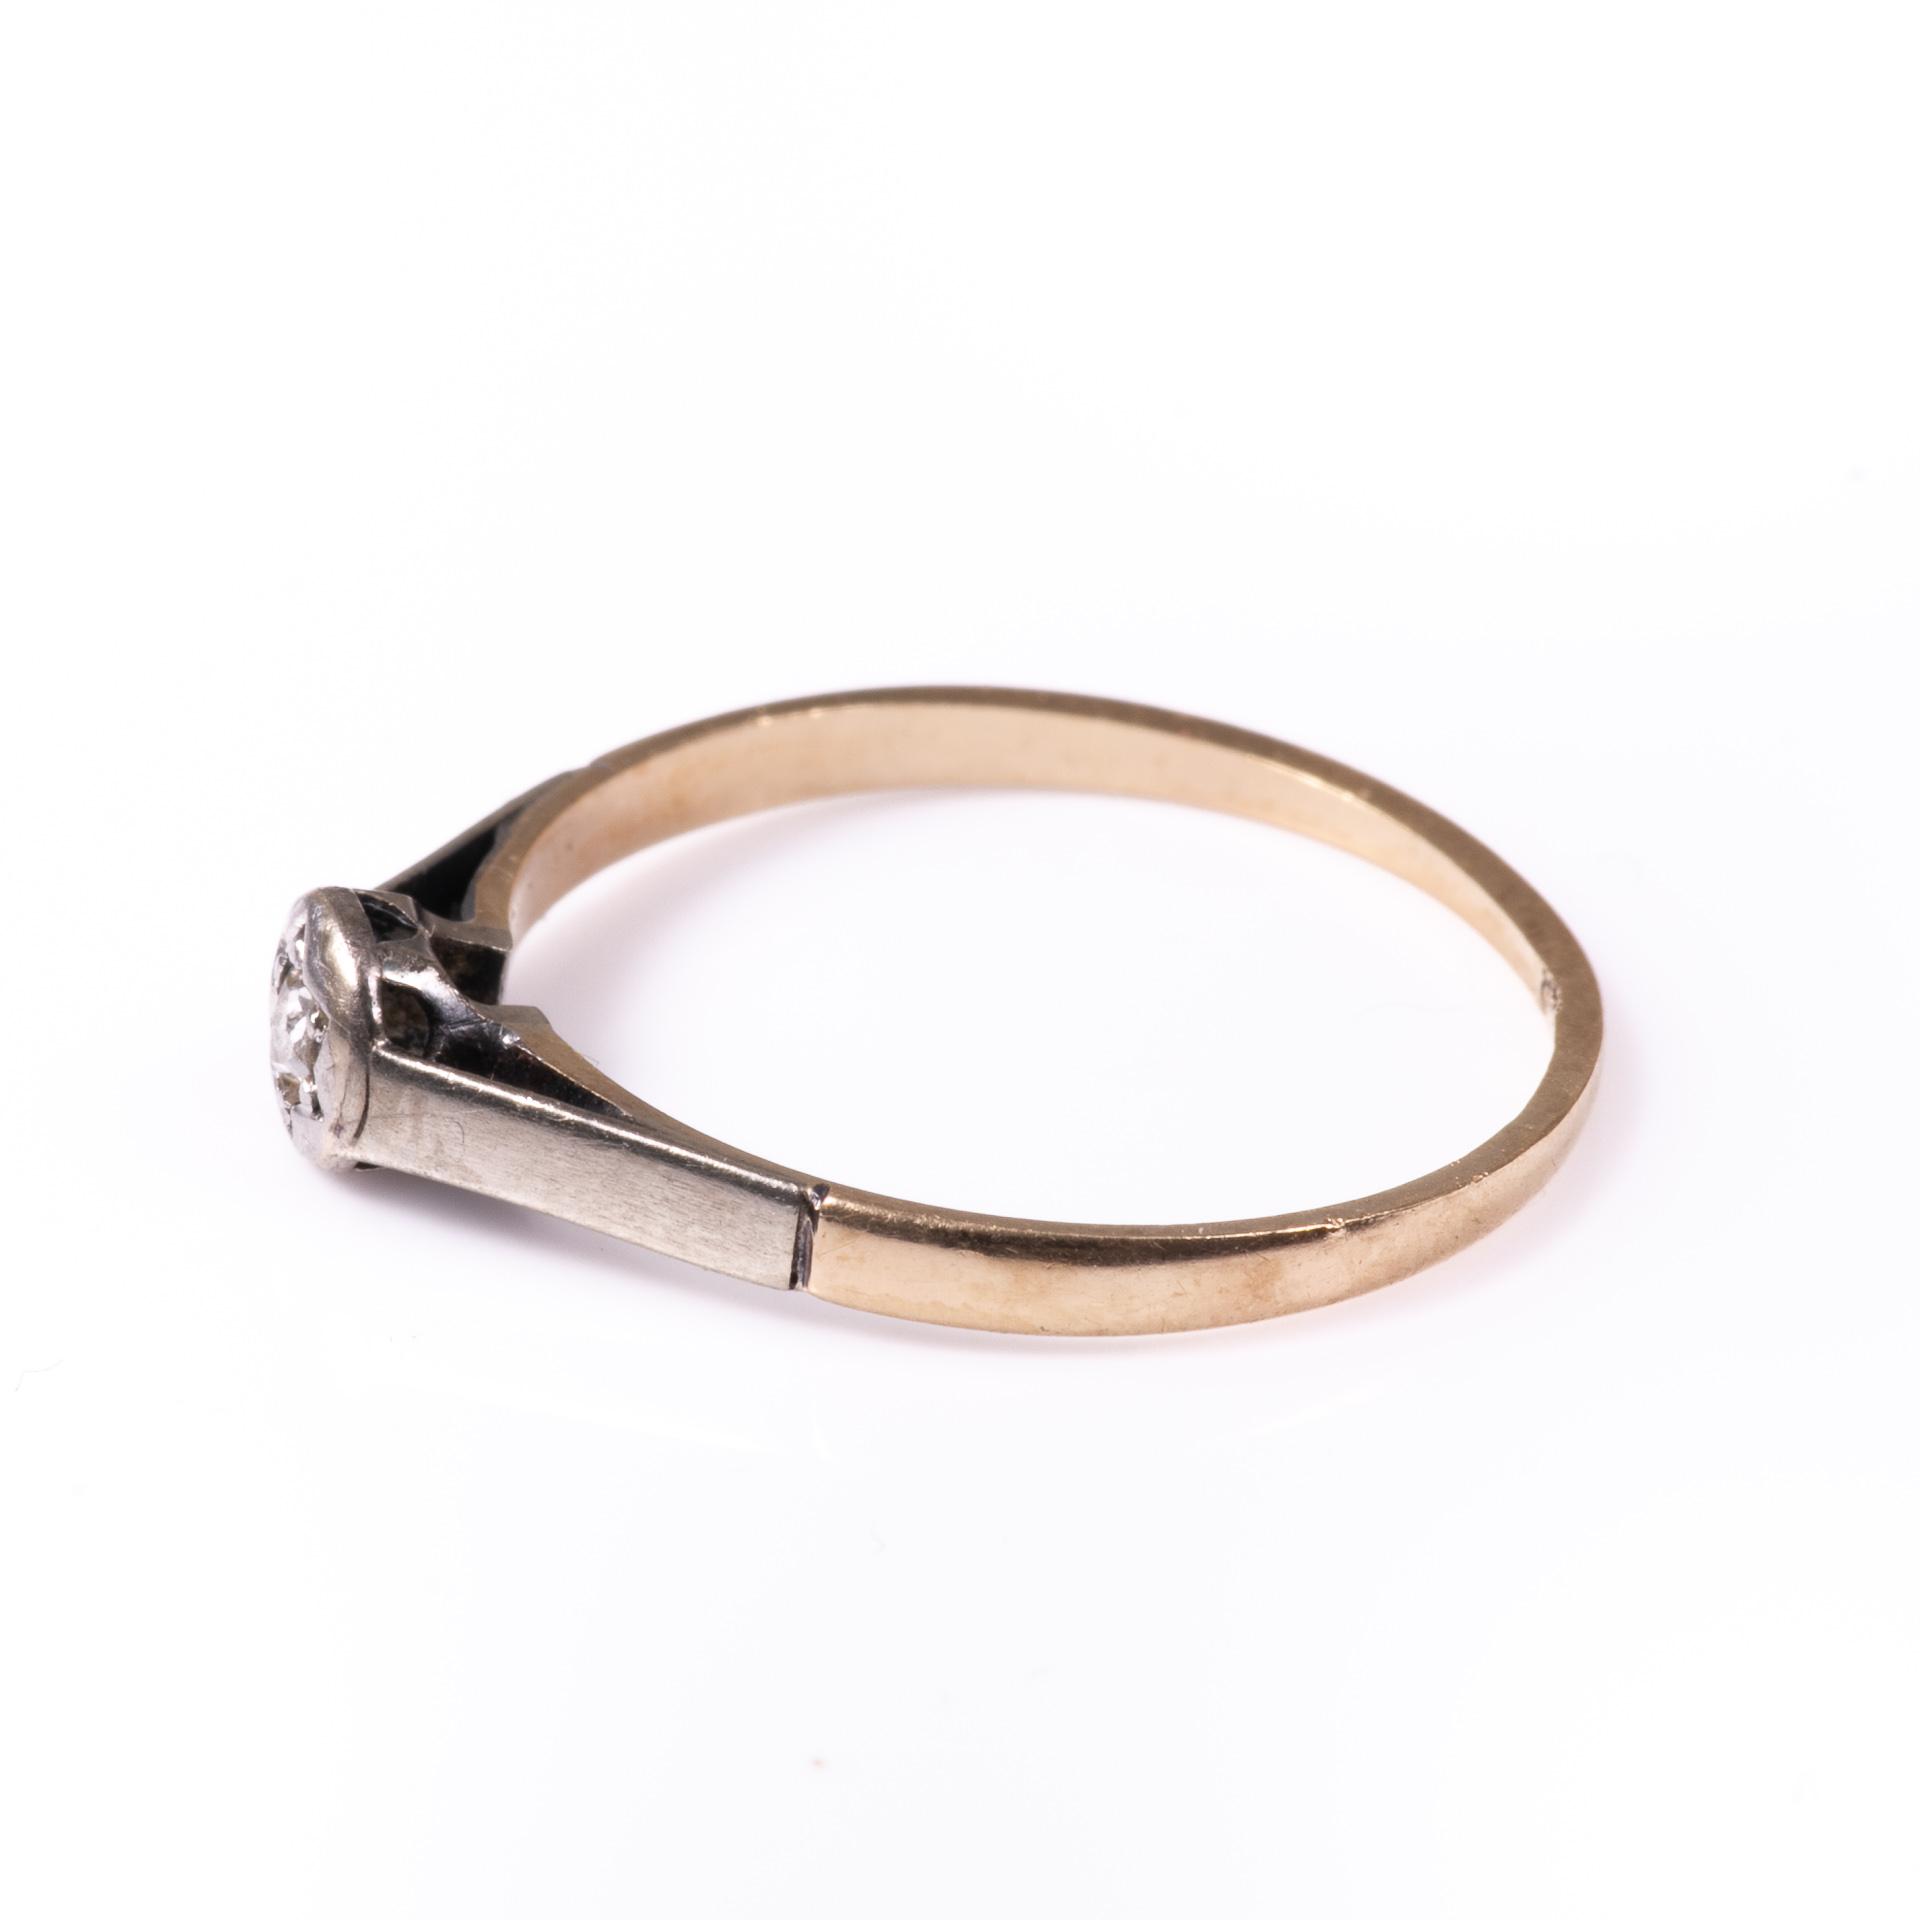 18ct Gold & Platinum Rose Cut Diamond Ring - Image 4 of 7